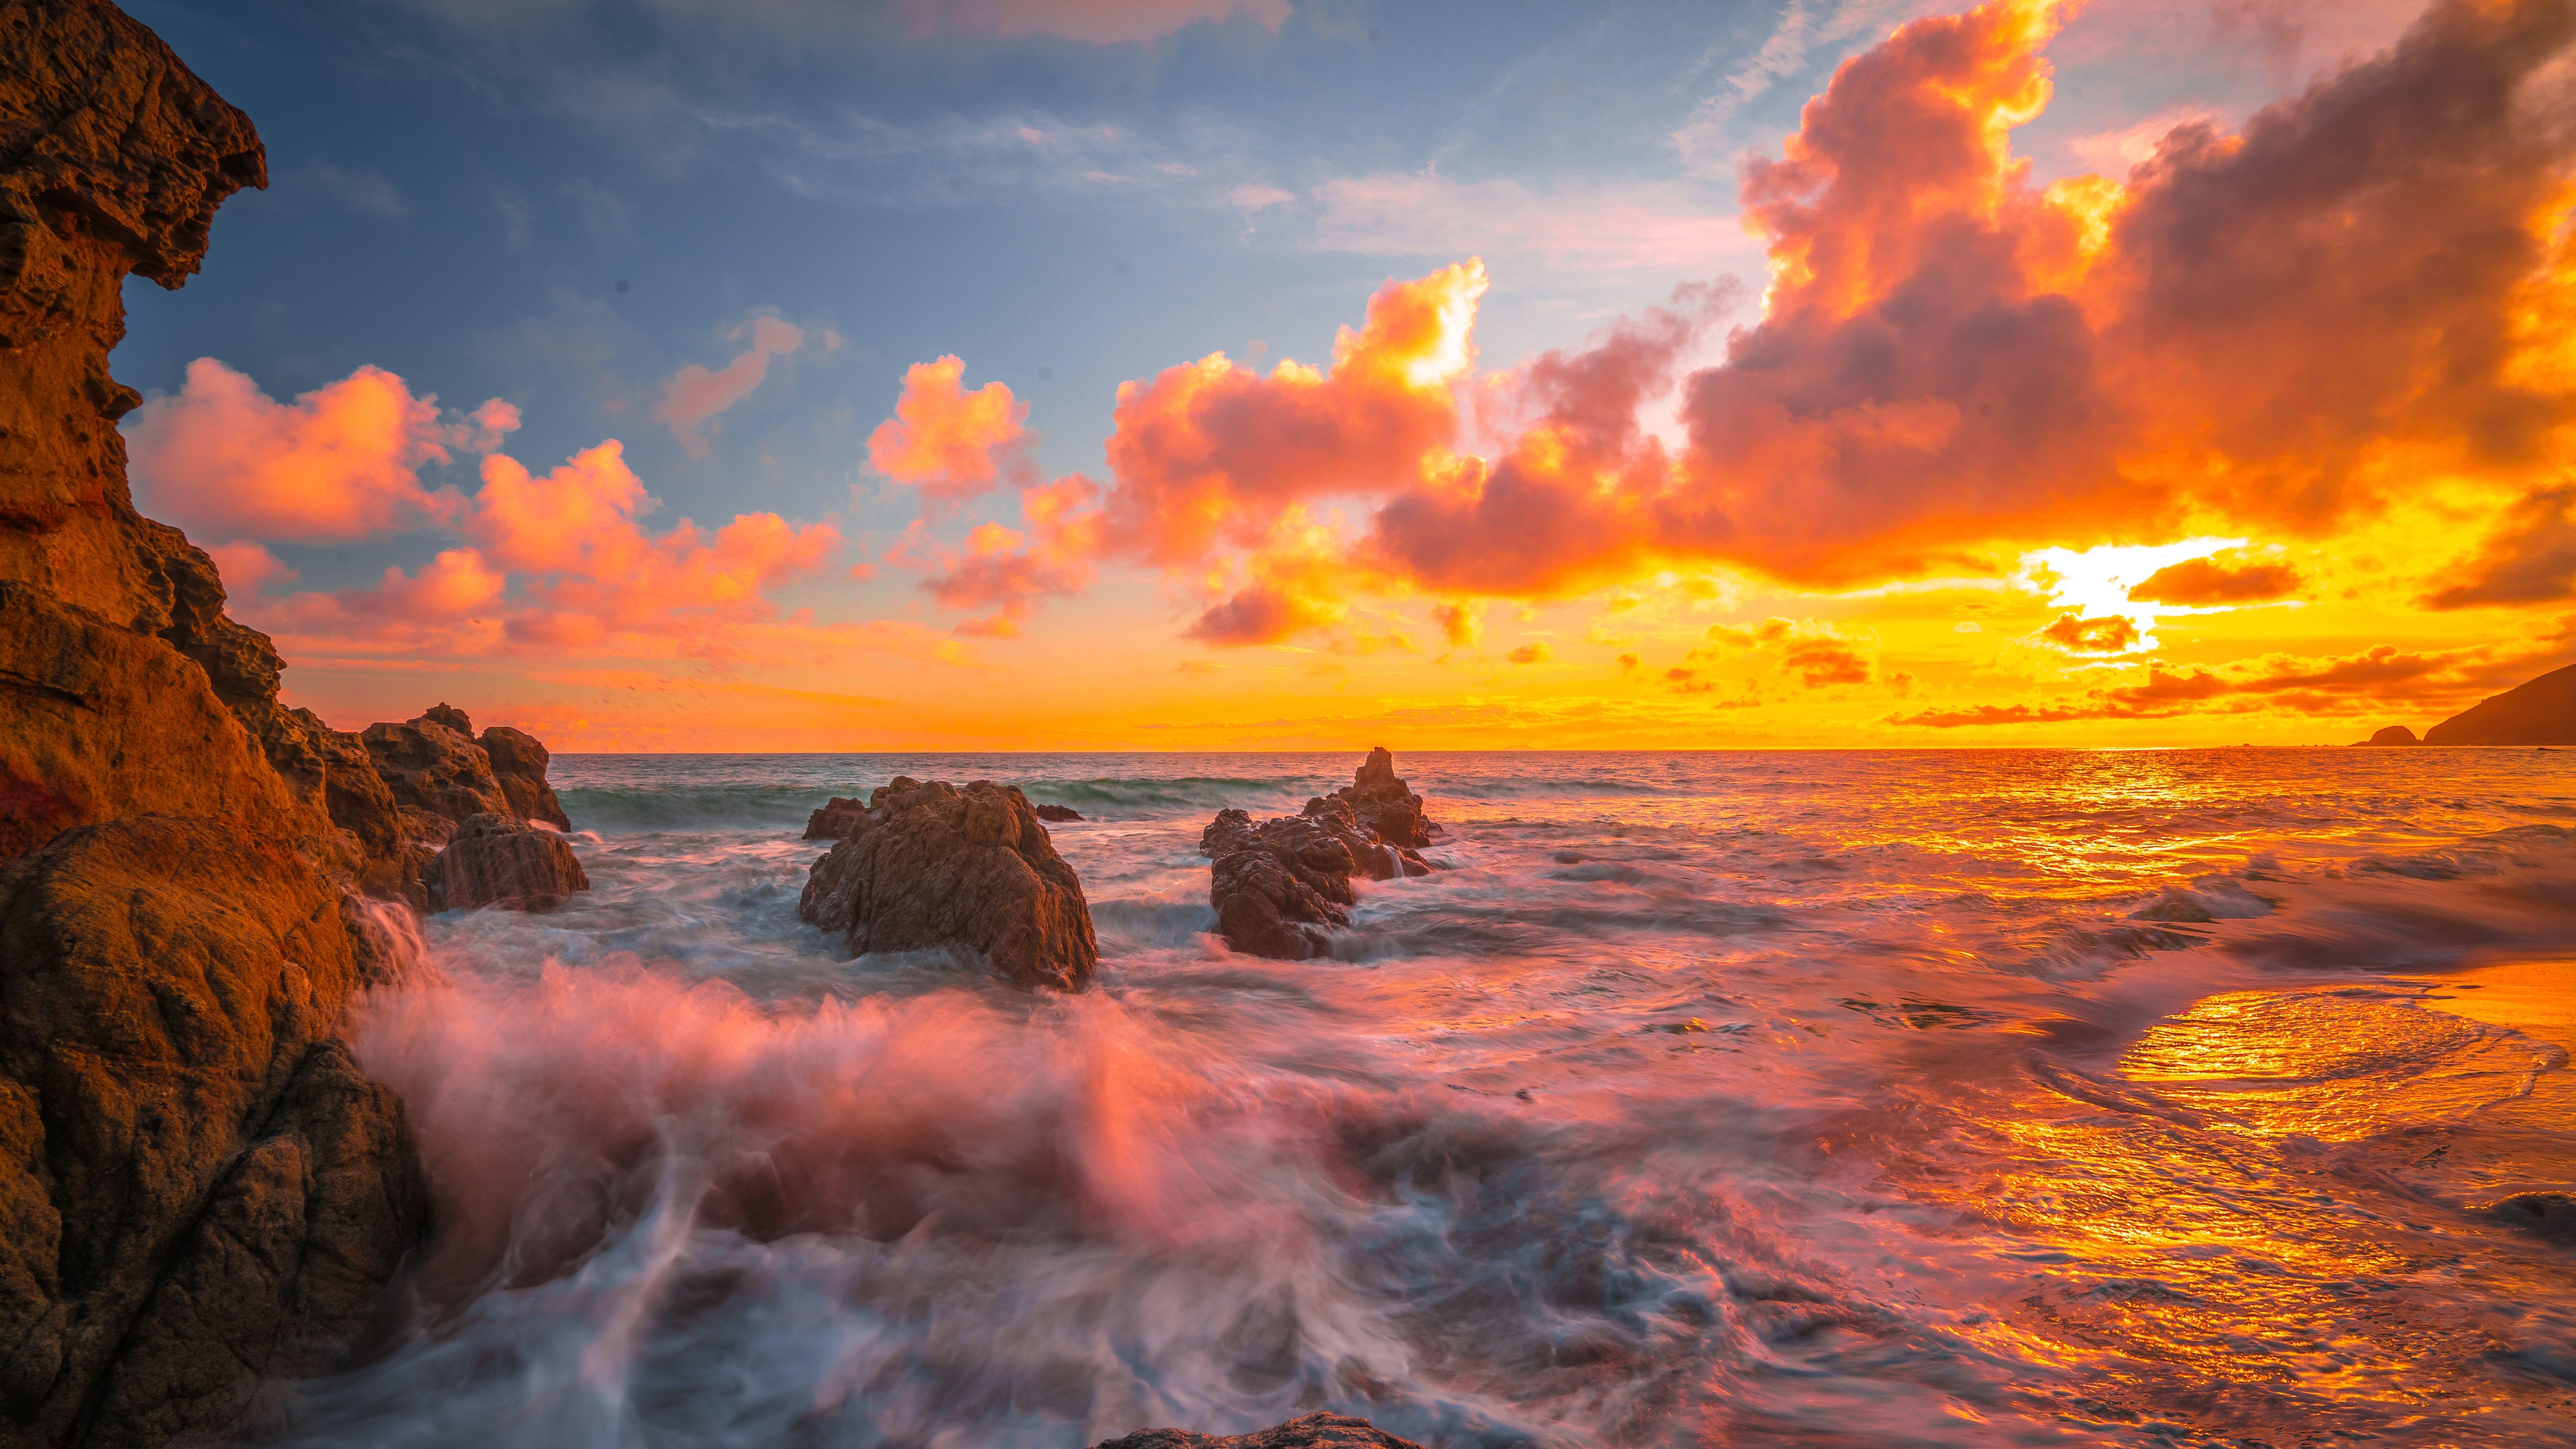 8k Sunset Wallpapers Top Free 8k Sunset Backgrounds Wallpaperaccess